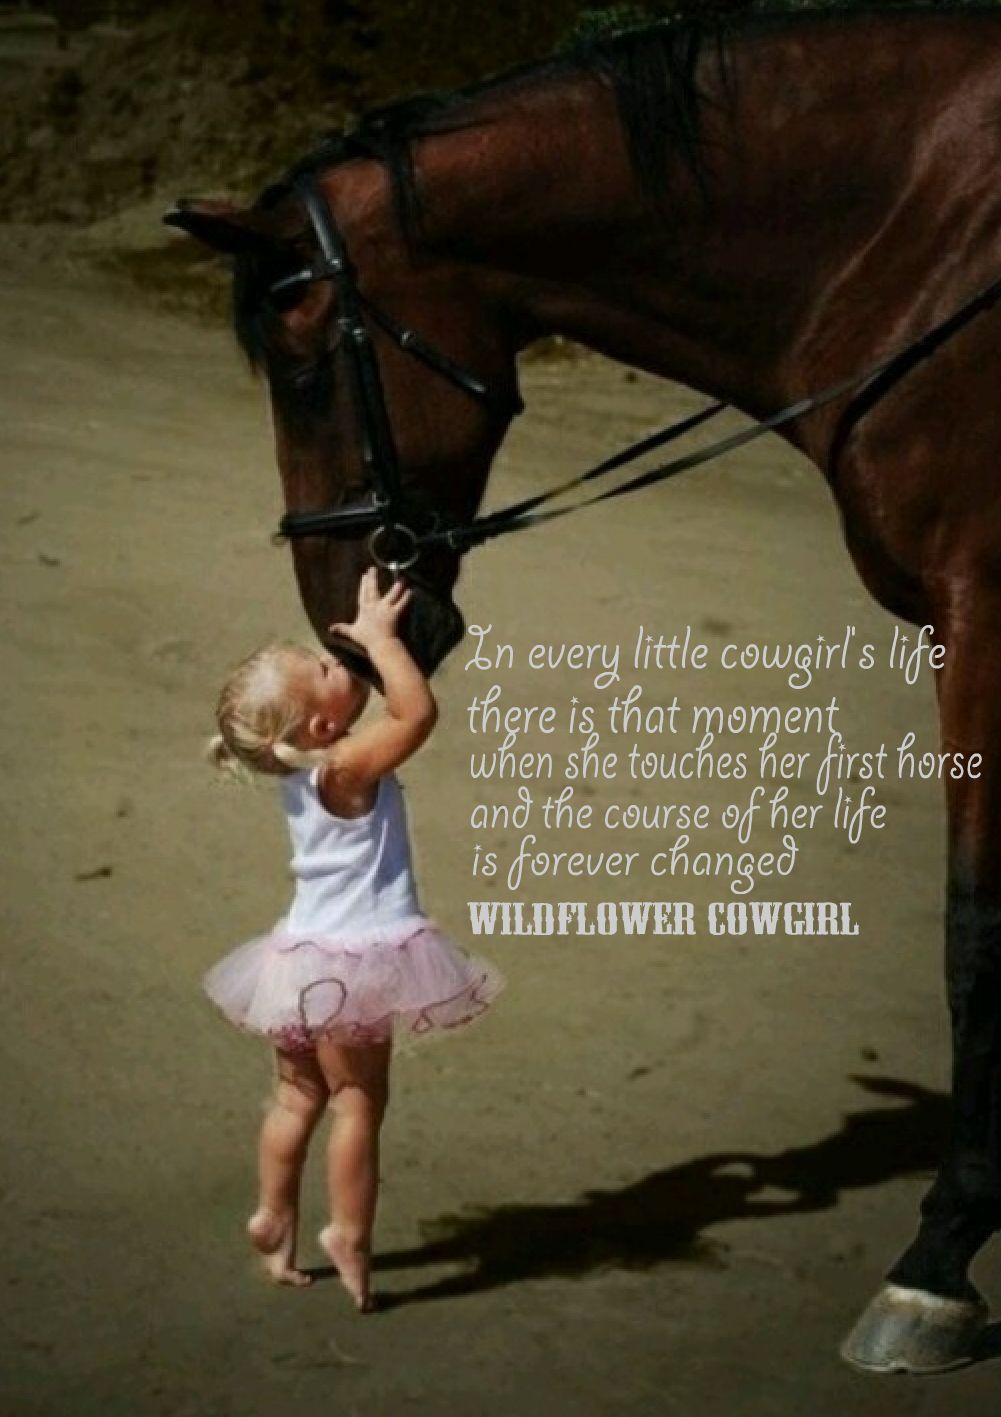 Pin By Brinley Baadsgaard On Stuff I Like Horses Horse Love